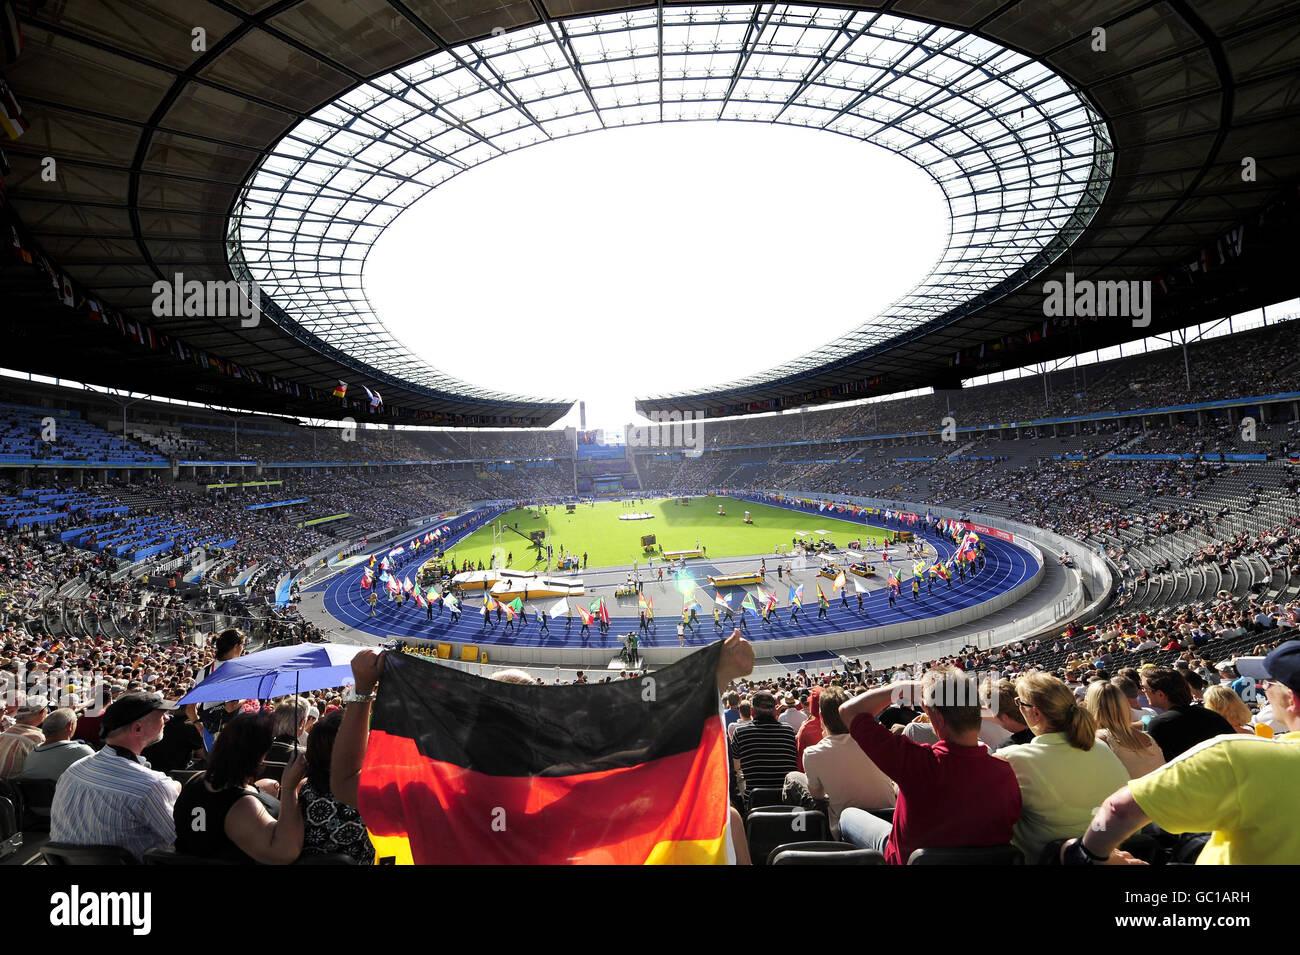 Athletics - IAAF World Athletics Championships - Day Two - Berlin 2009 - Olympiastadion - Stock Image